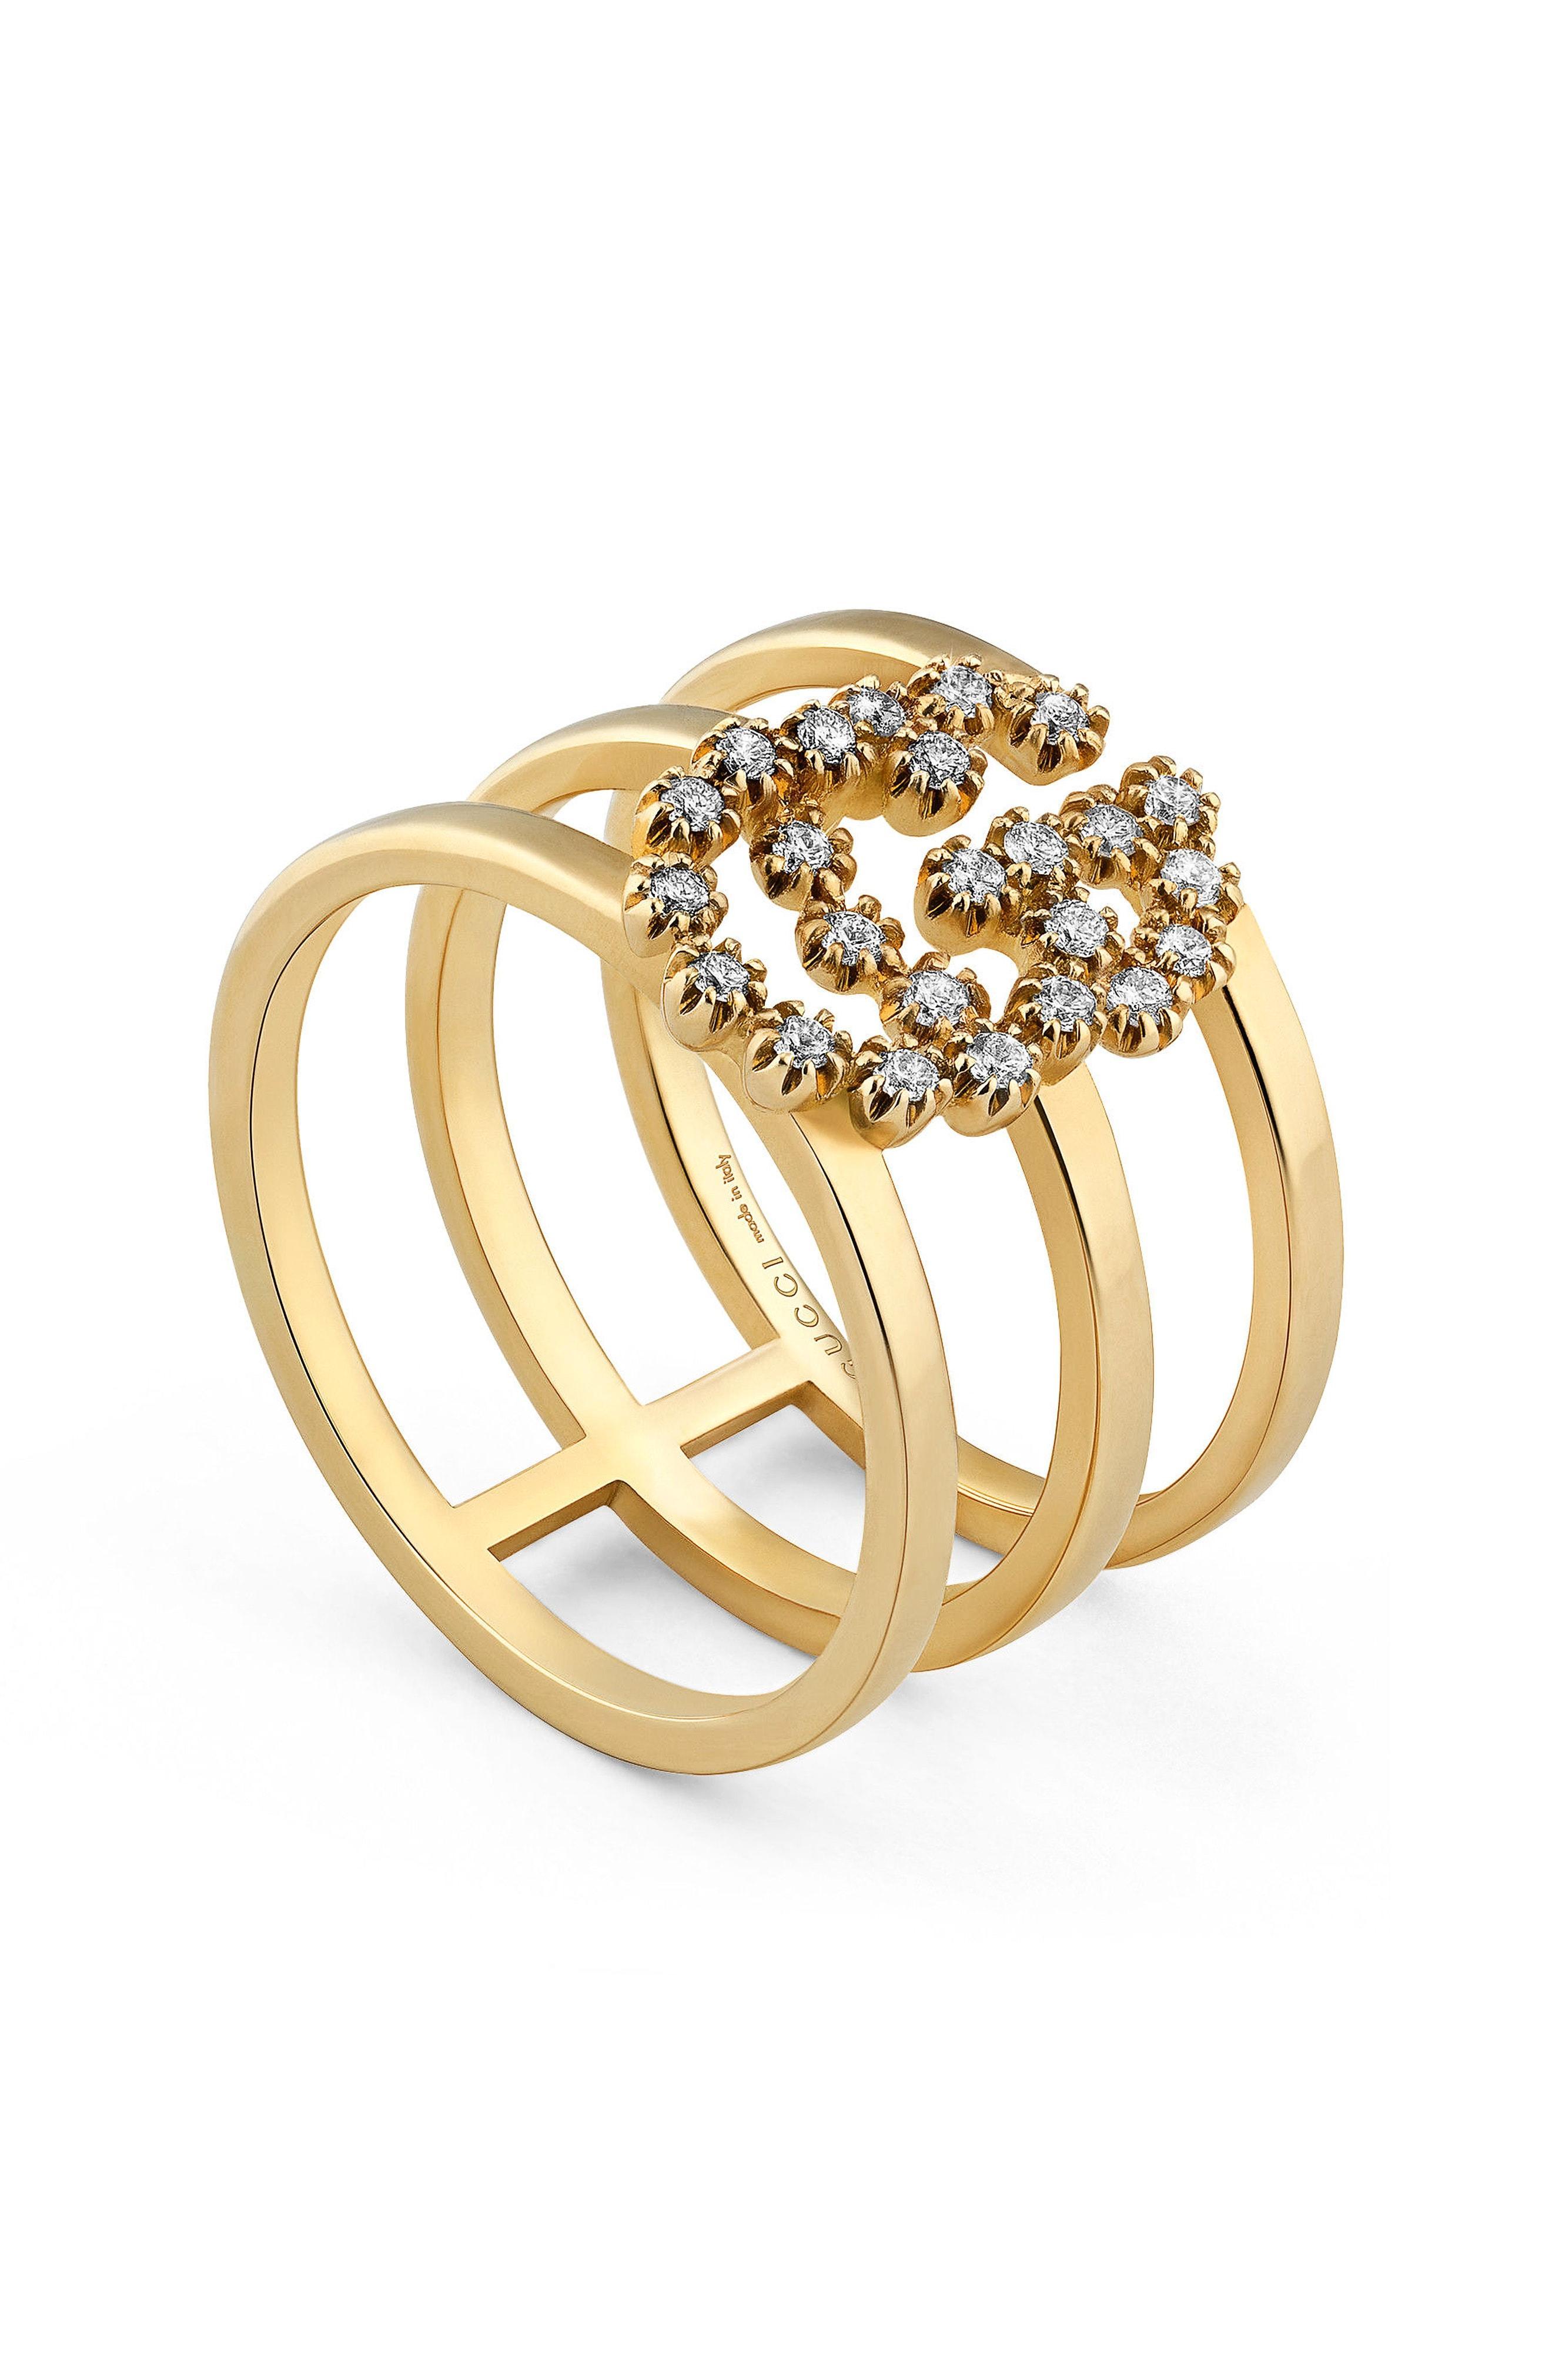 051f3638d5a32 18K Yellow Gold Running G Triple Band Diamond Ring